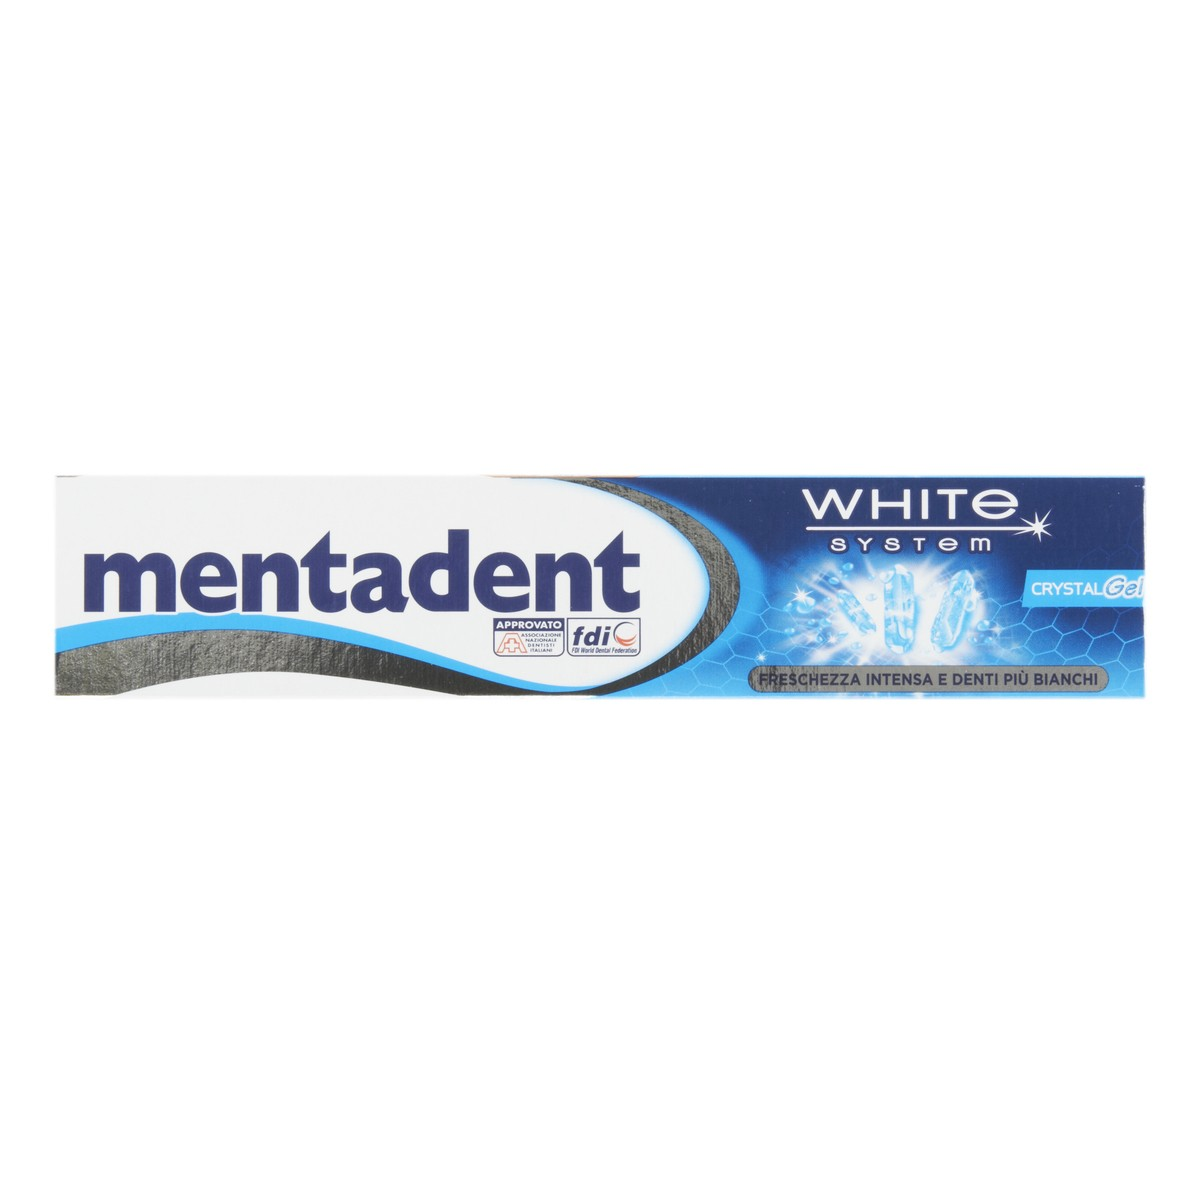 Mentadent Dentifricio White System Crystal Gel